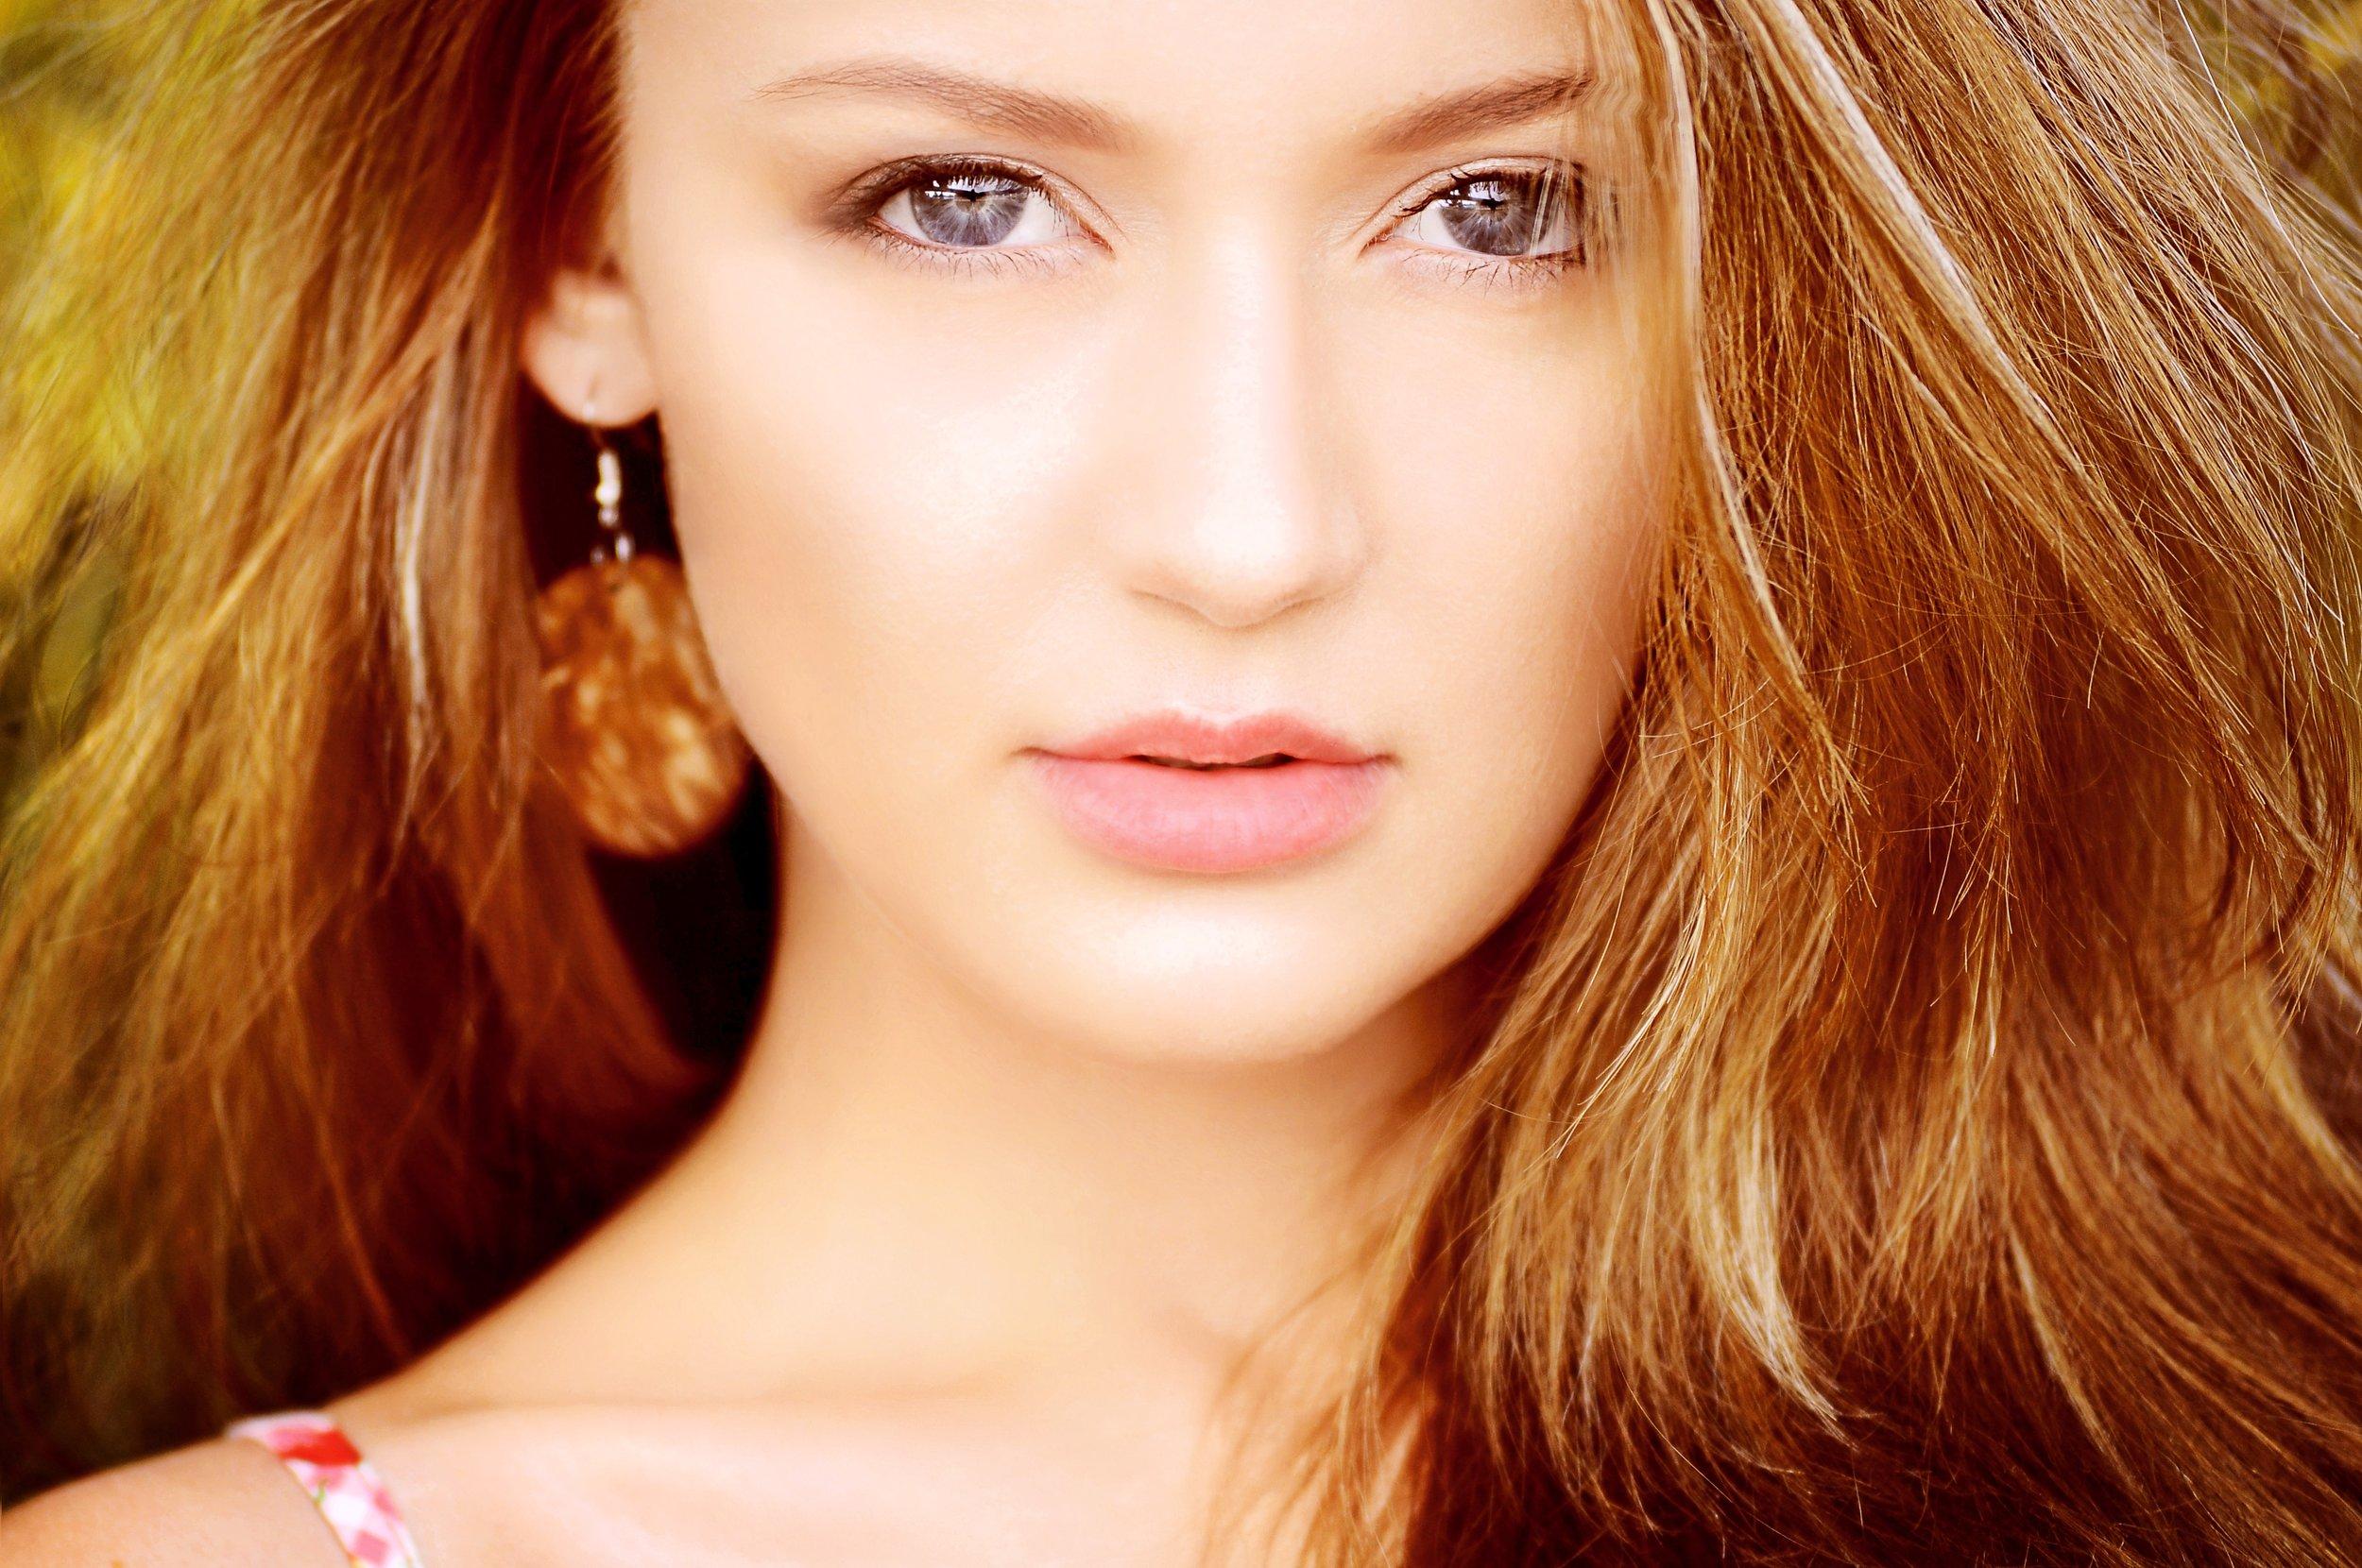 uwm.cosmetics.light-girl-woman-hair-photography-view-603664-pxhere.com